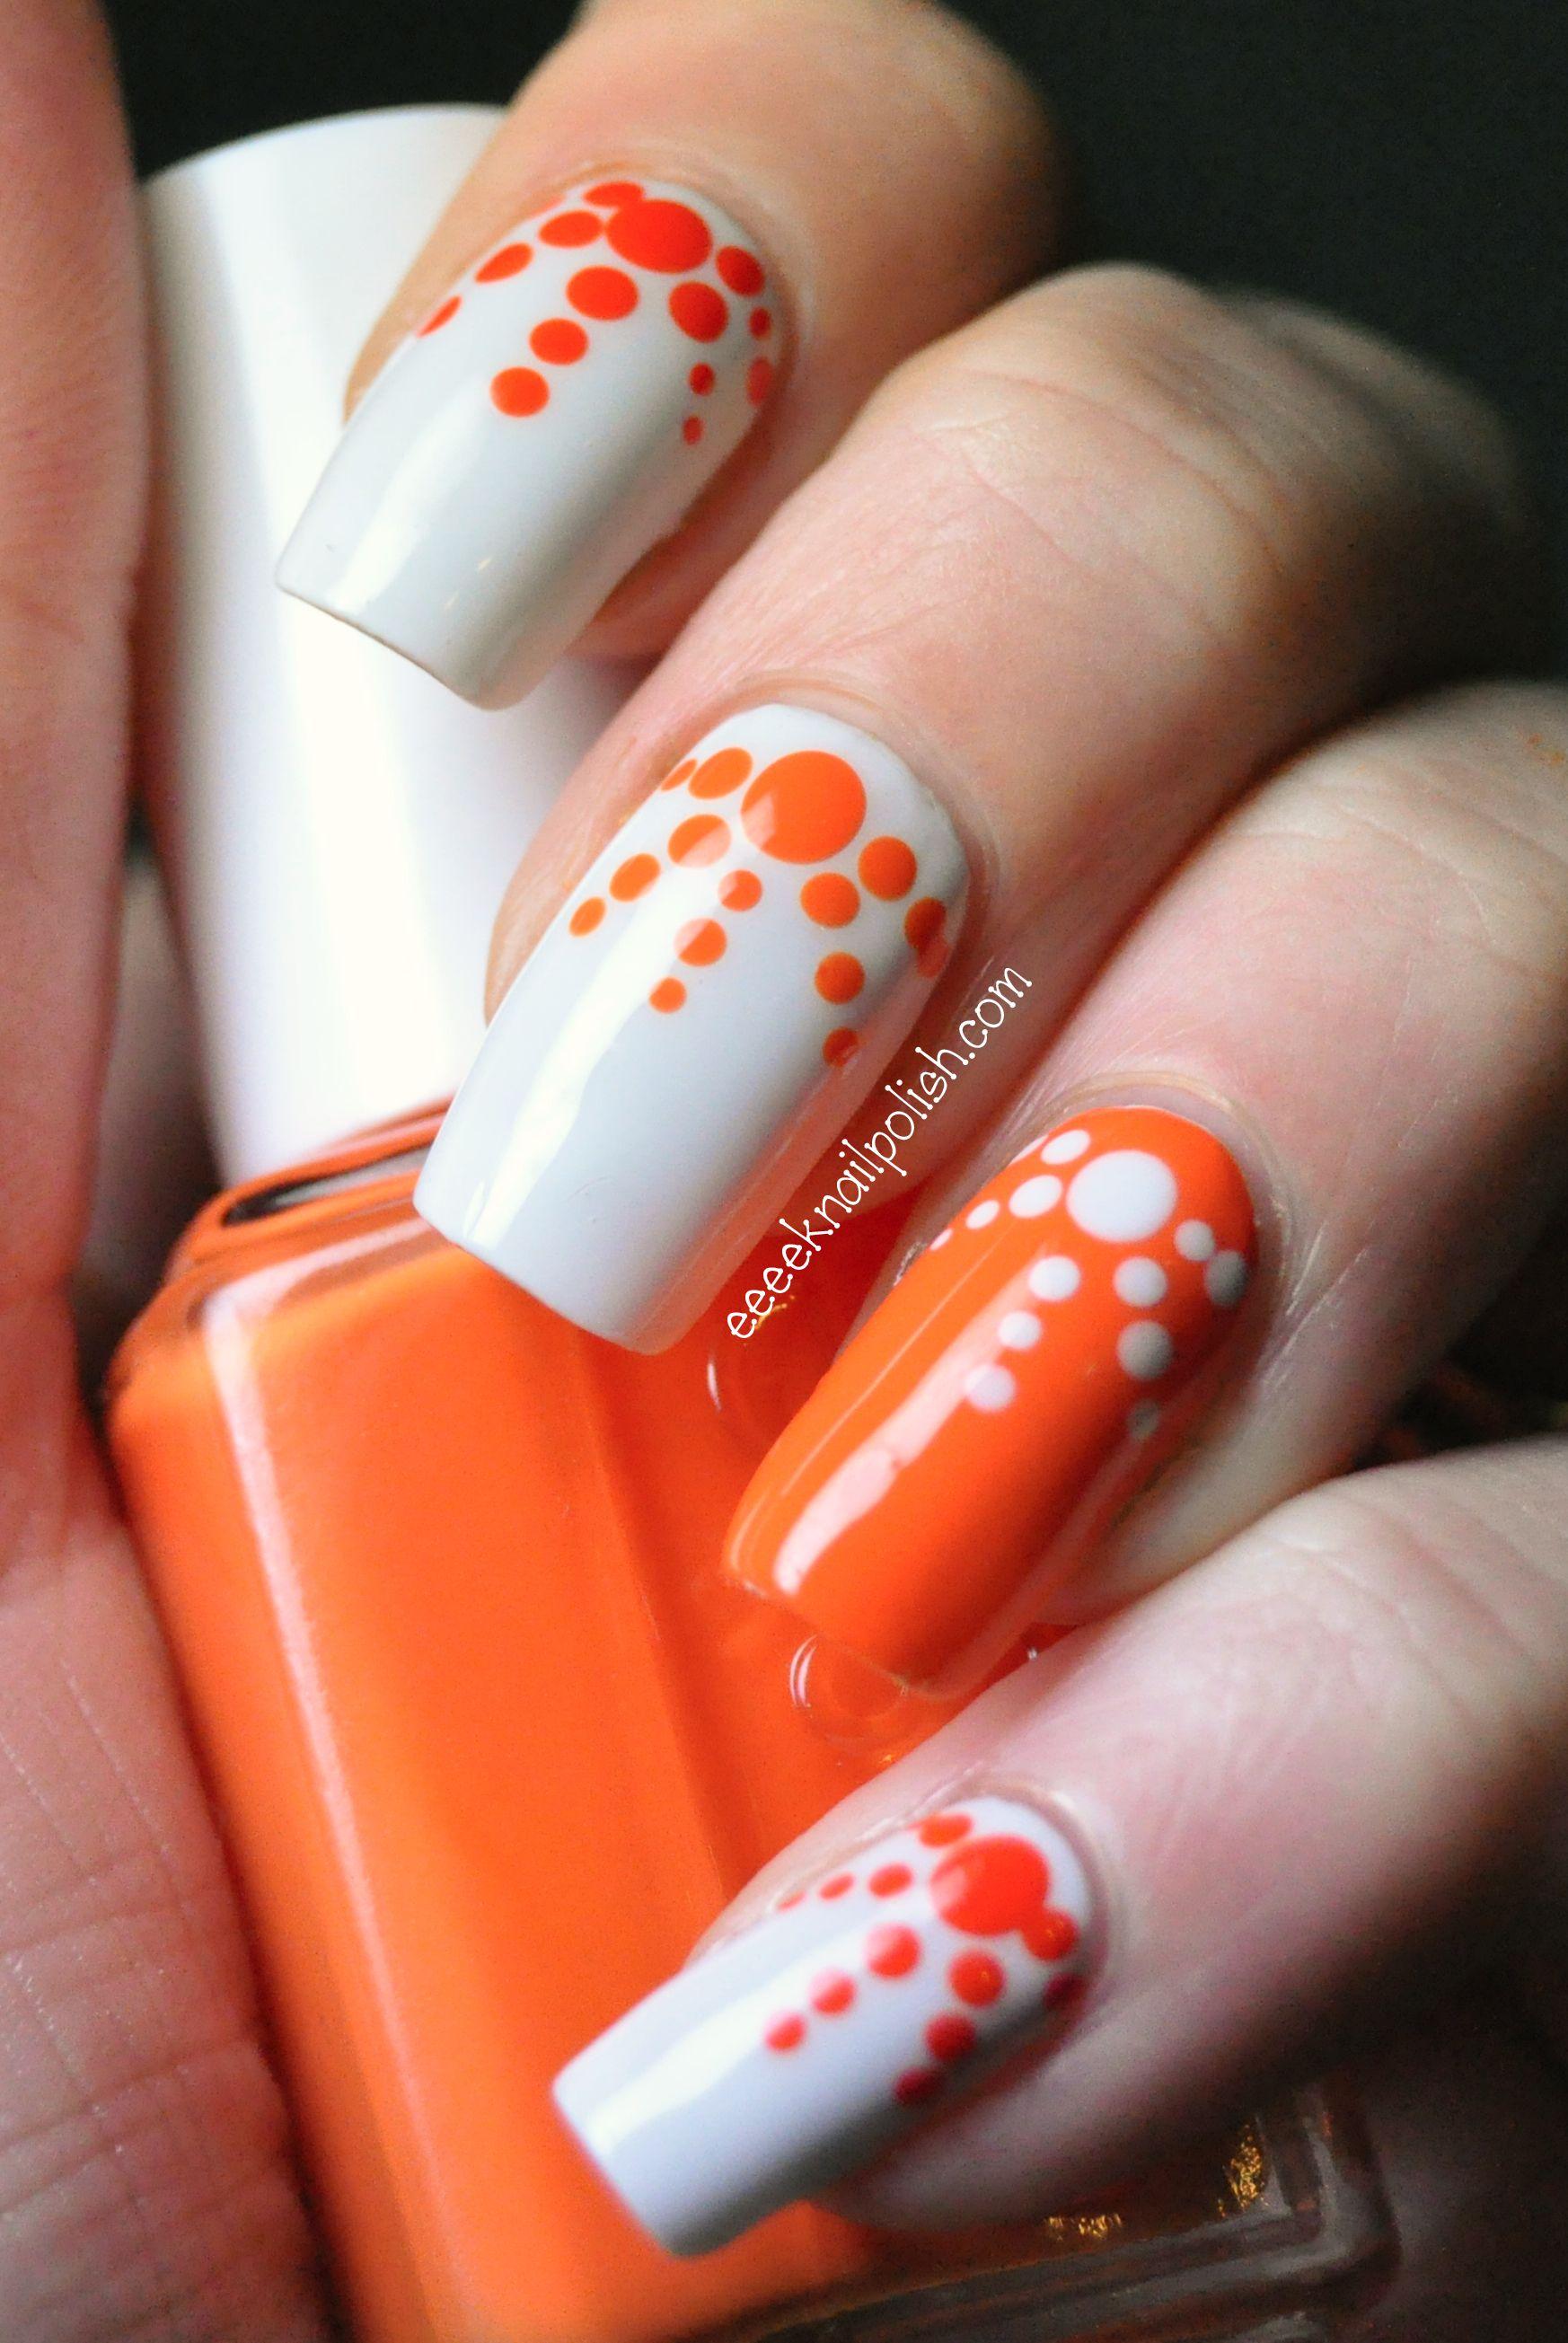 Amazingly cute and fabulous nail art designs - Explore Orange Nail Designs Orange Nail Art And More